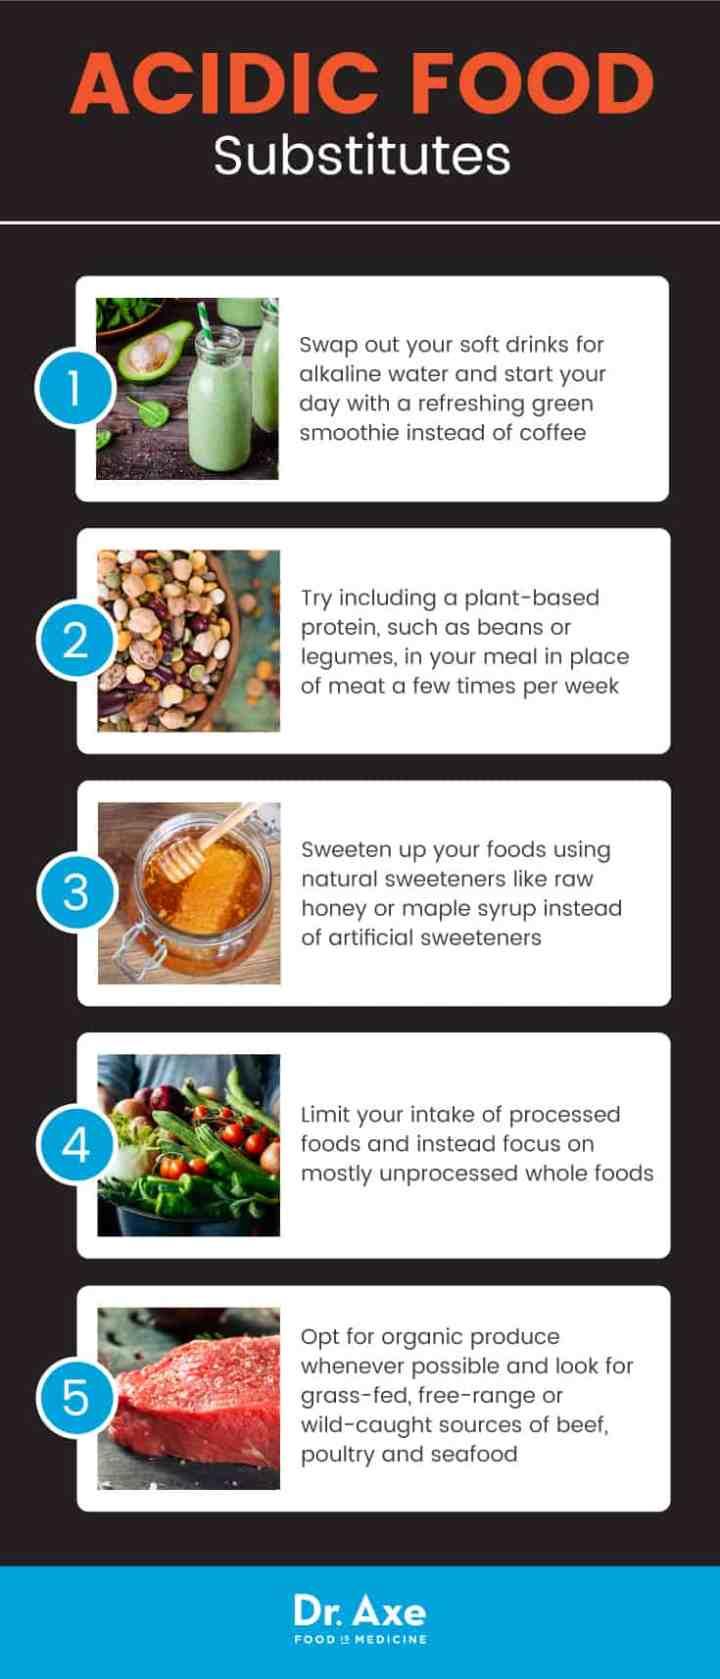 Acidic food substitutes - Dr. Axe